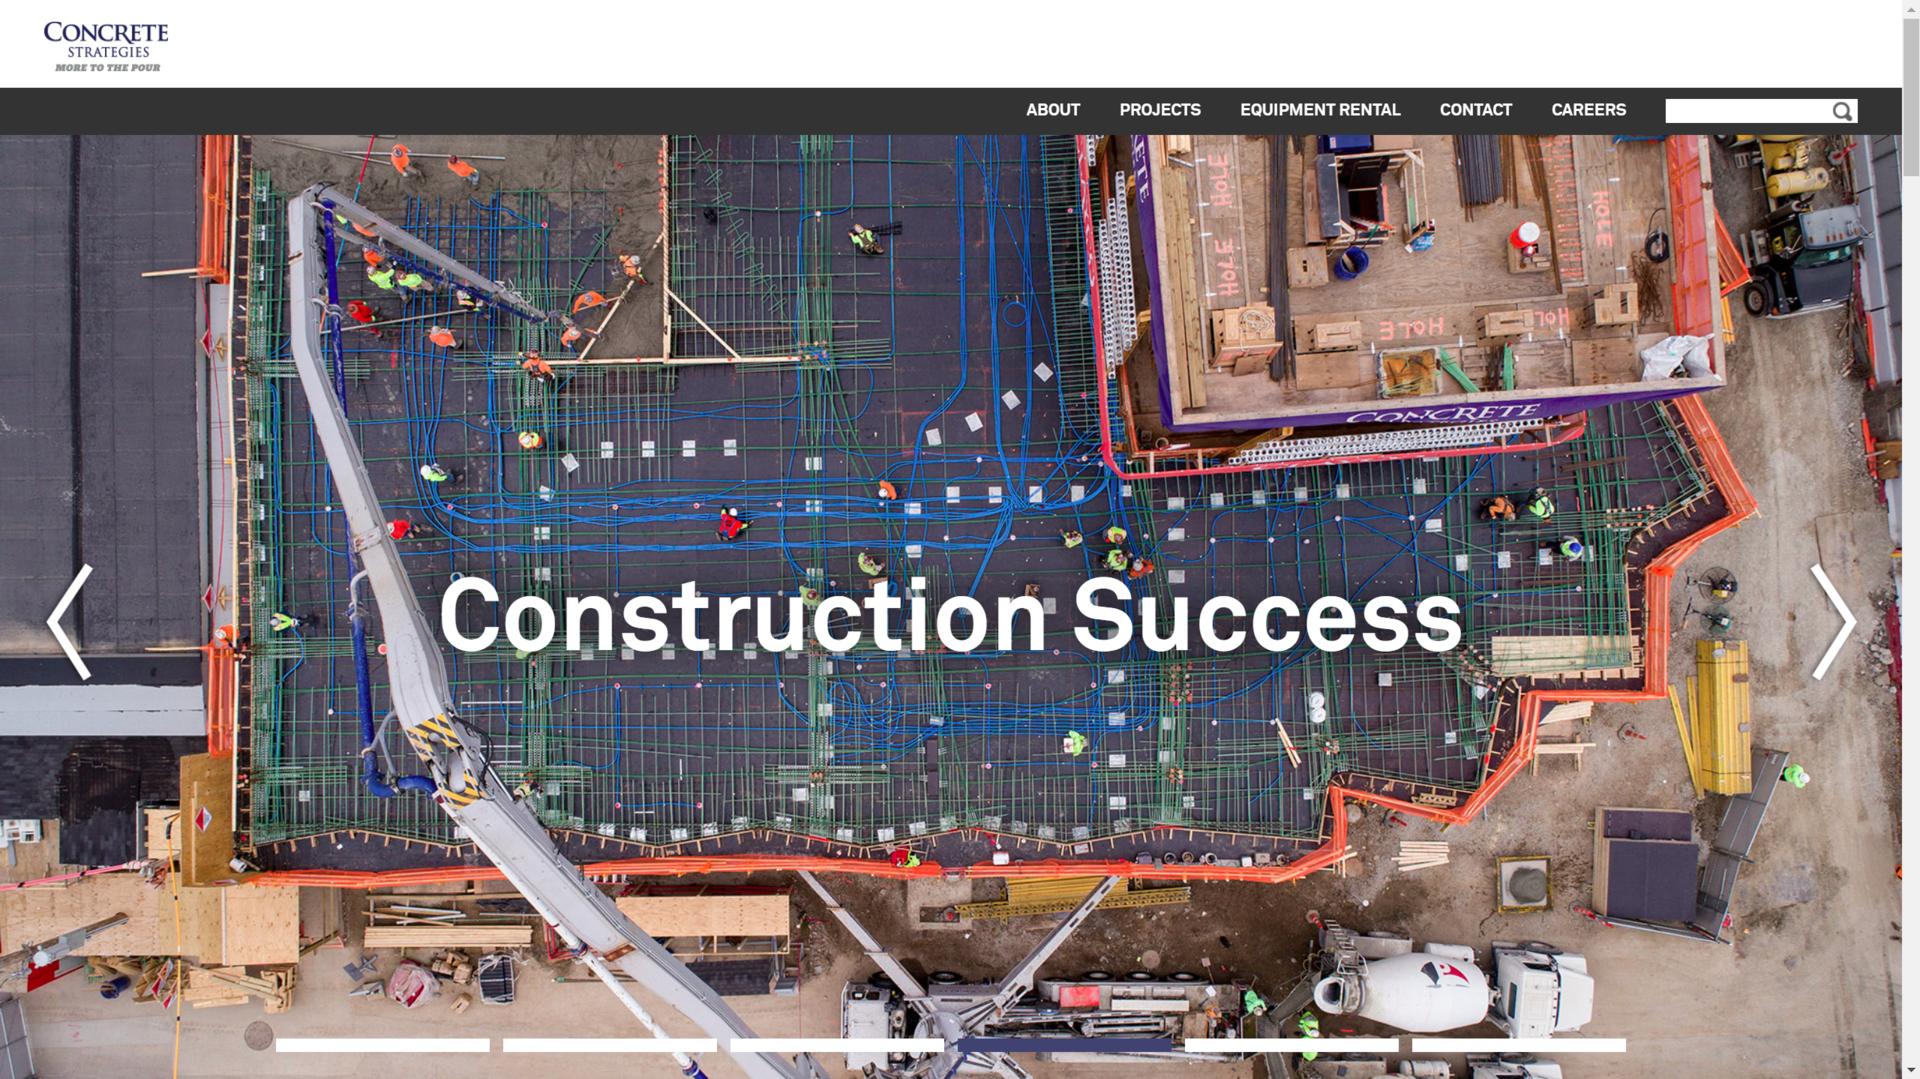 Concrete Strategies Homepage